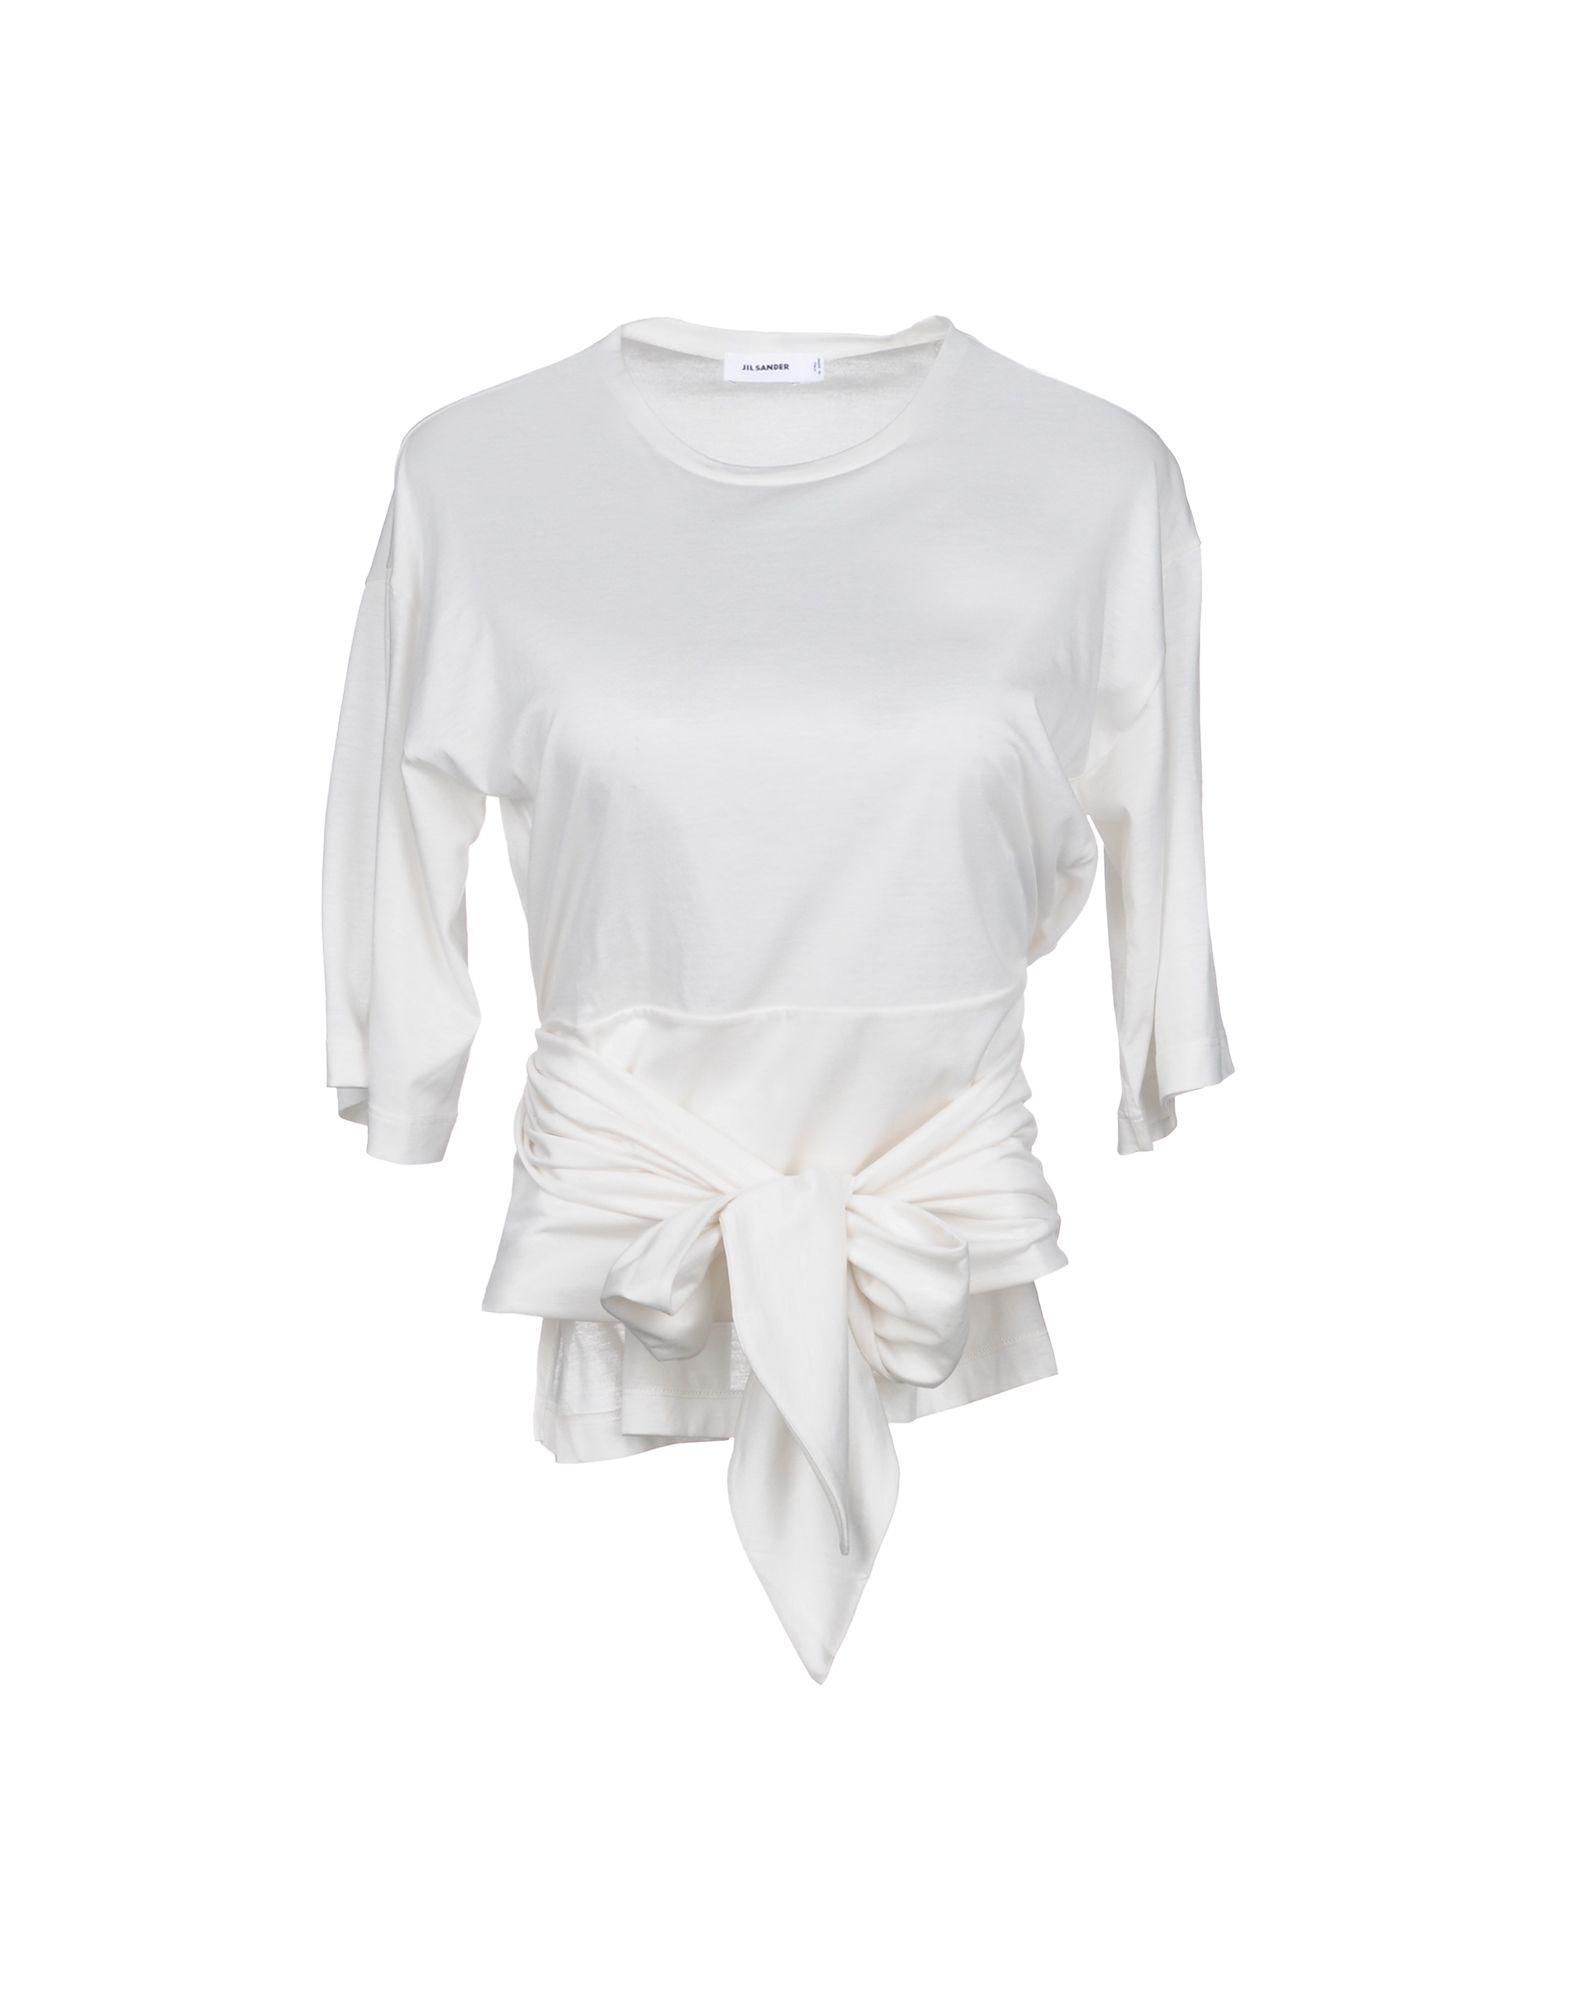 Jil Sander T-shirts In White